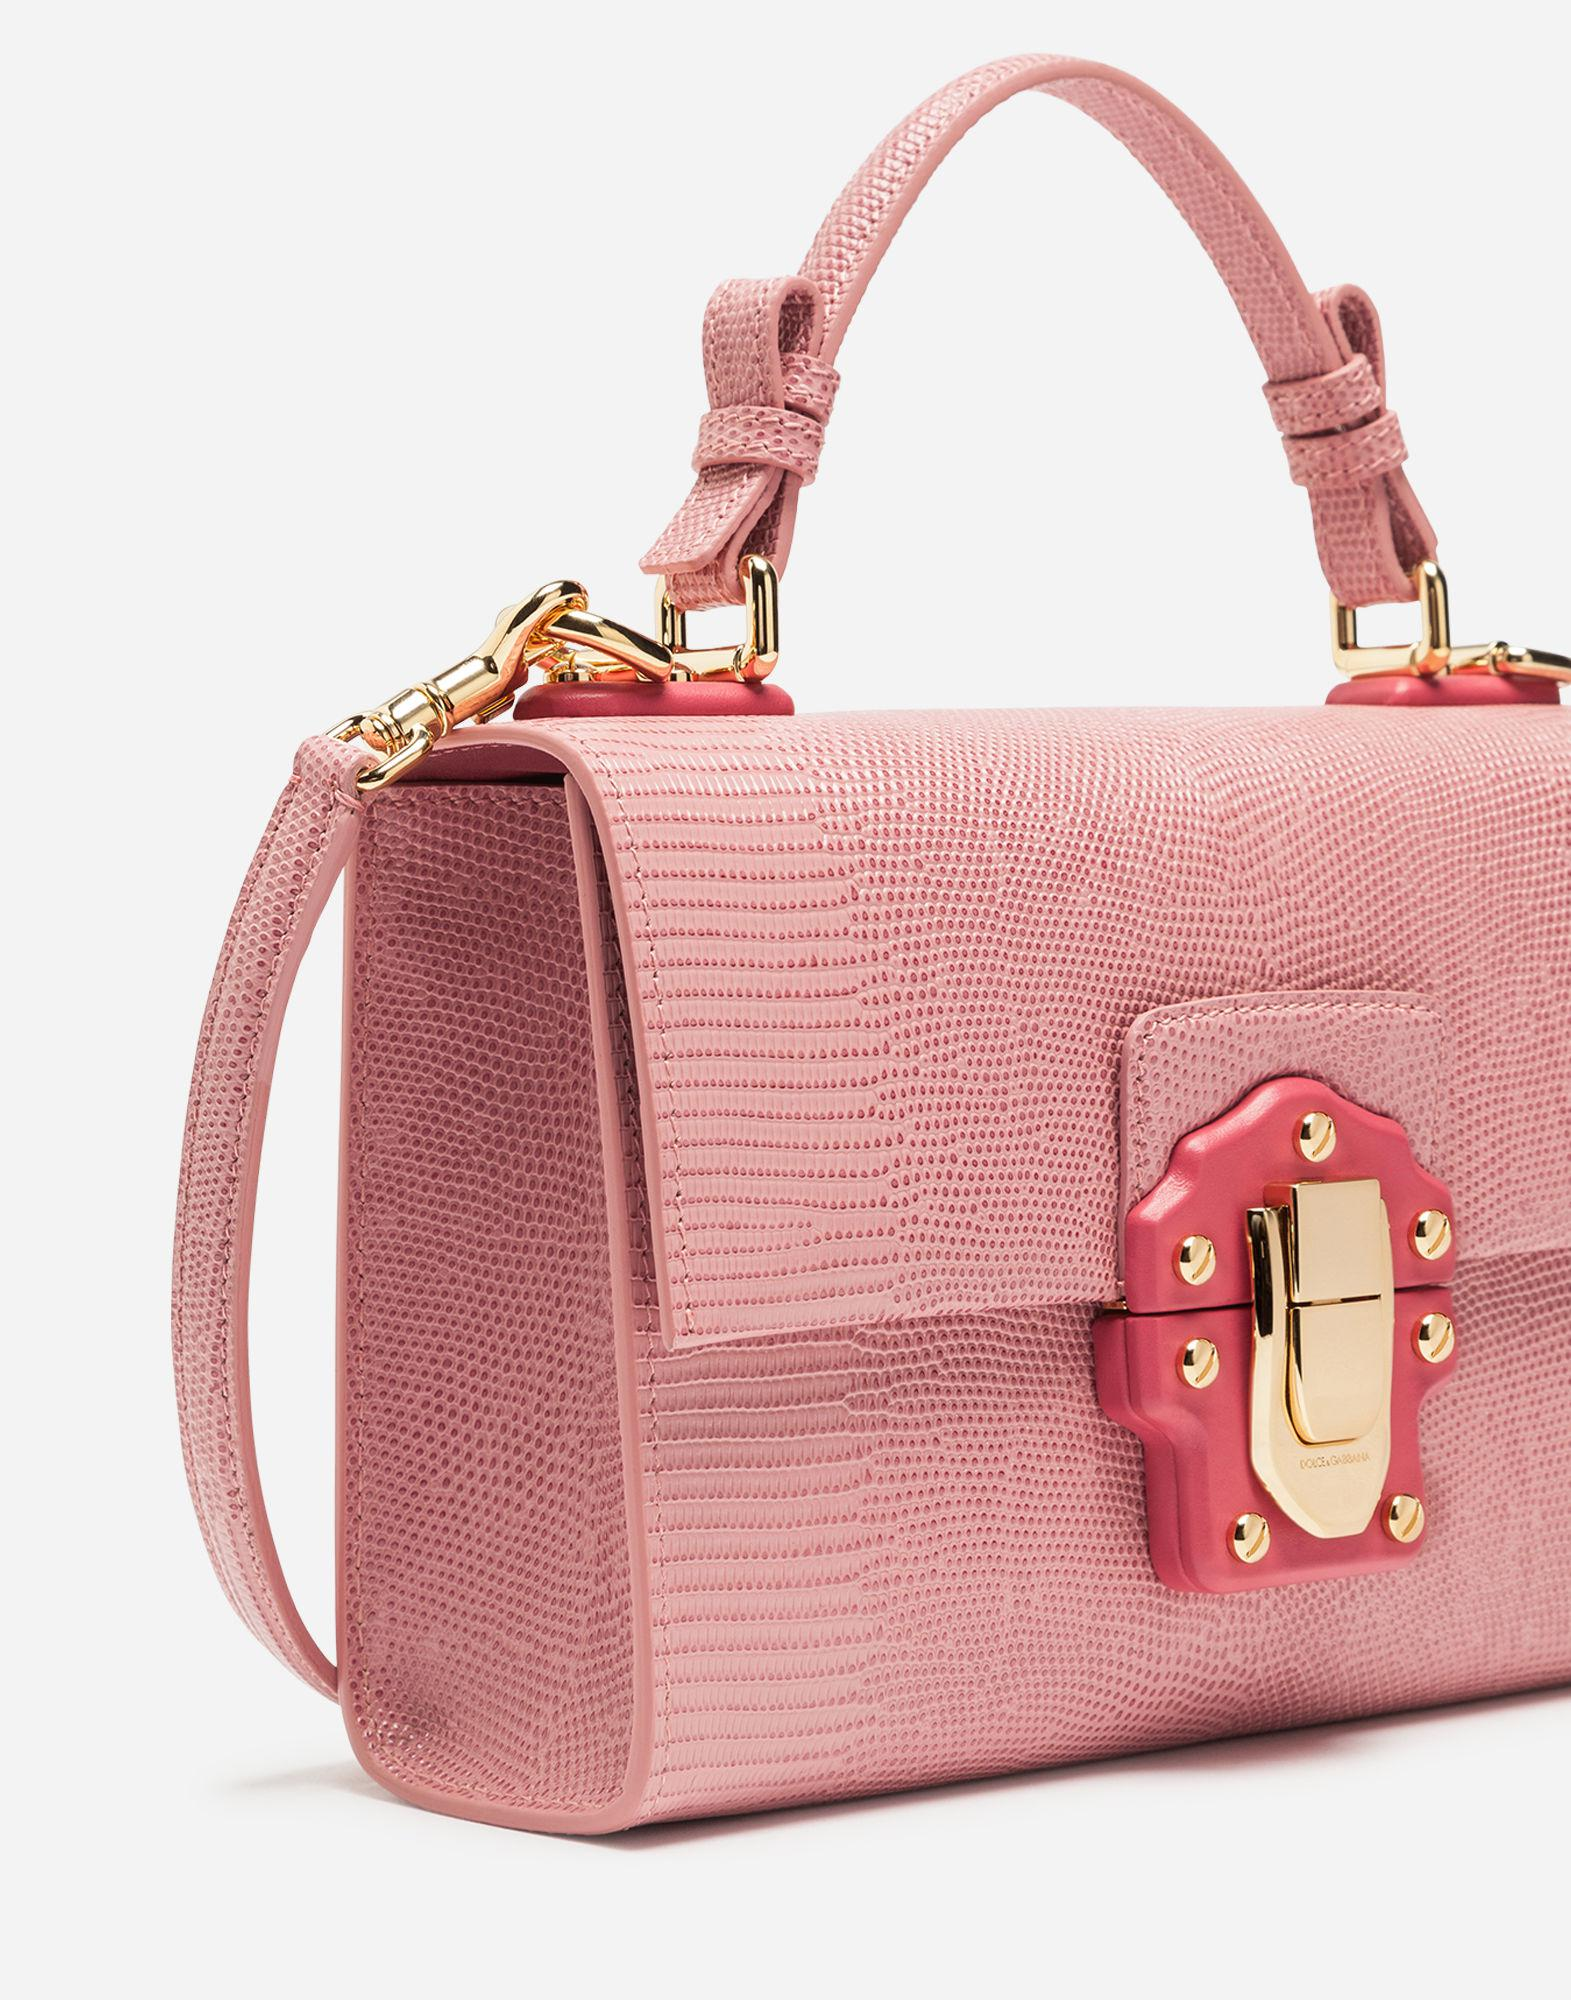 Lyst - Dolce   Gabbana Lucia Top Handle Bag In Calfskin in Pink f3674f4d9c9a6